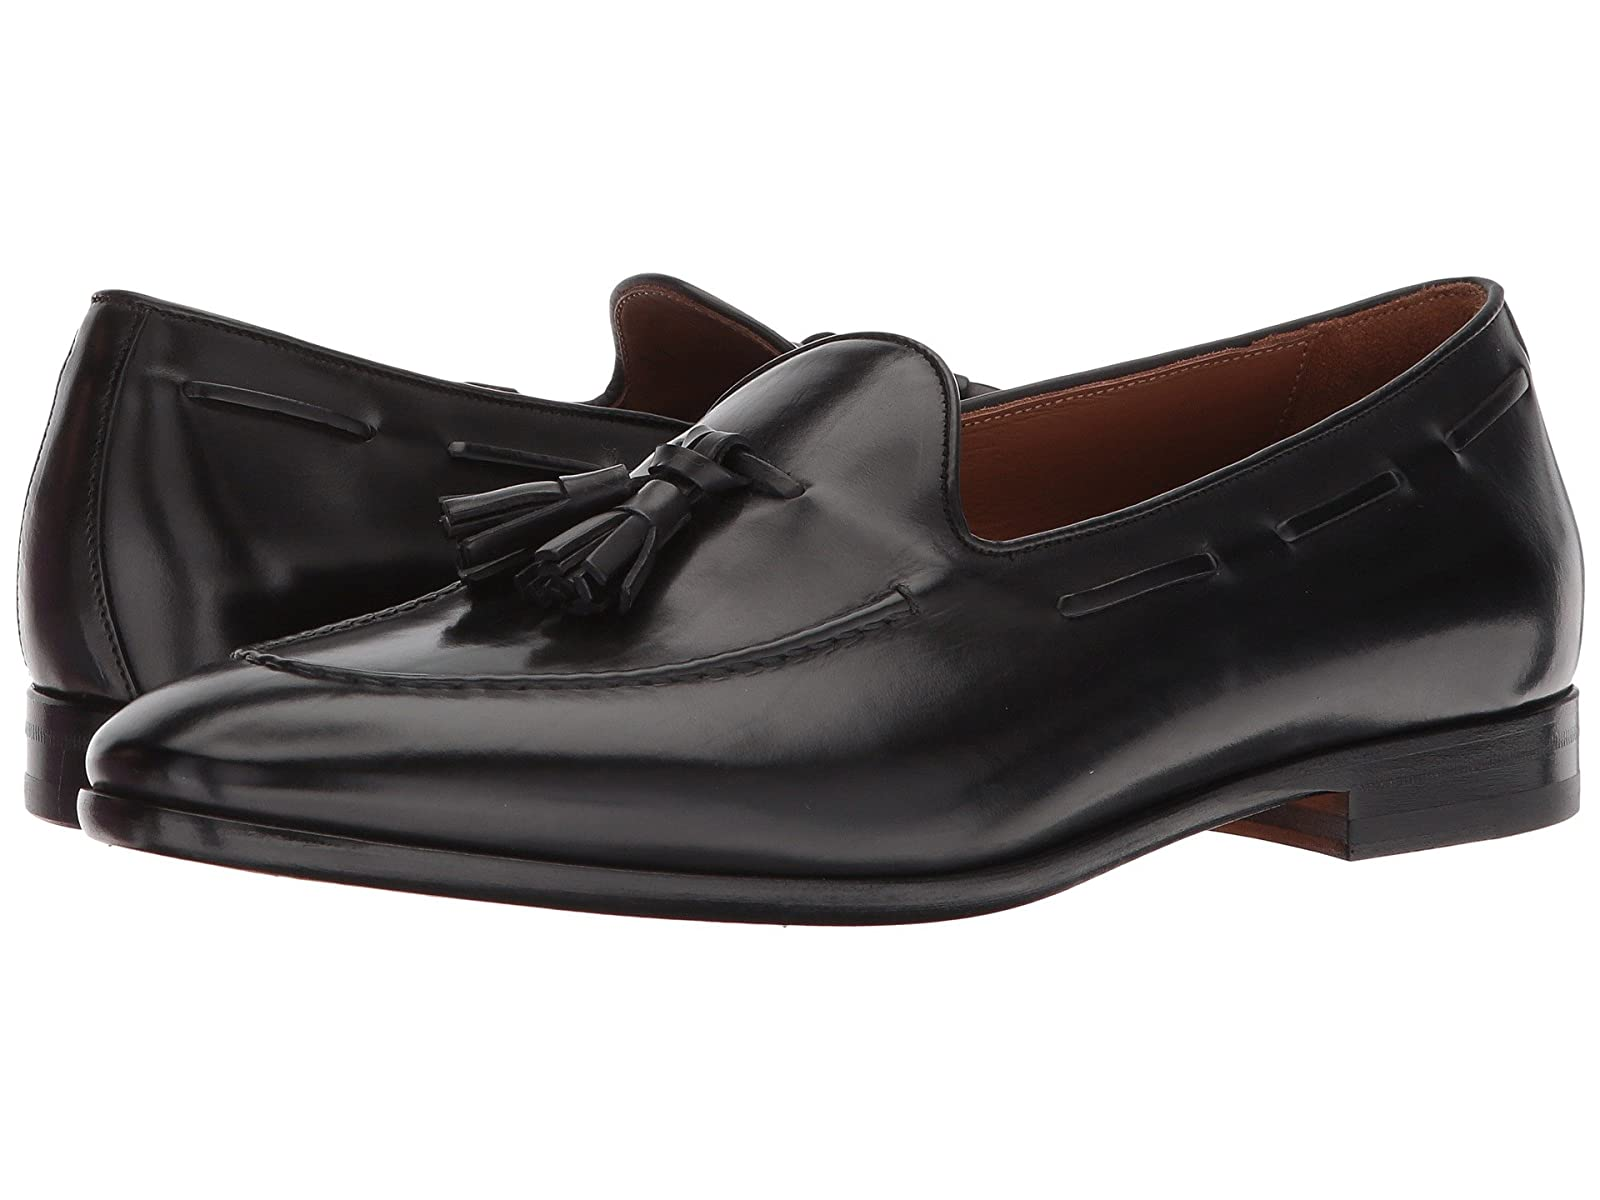 Bruno Magli AliAtmospheric grades have affordable shoes